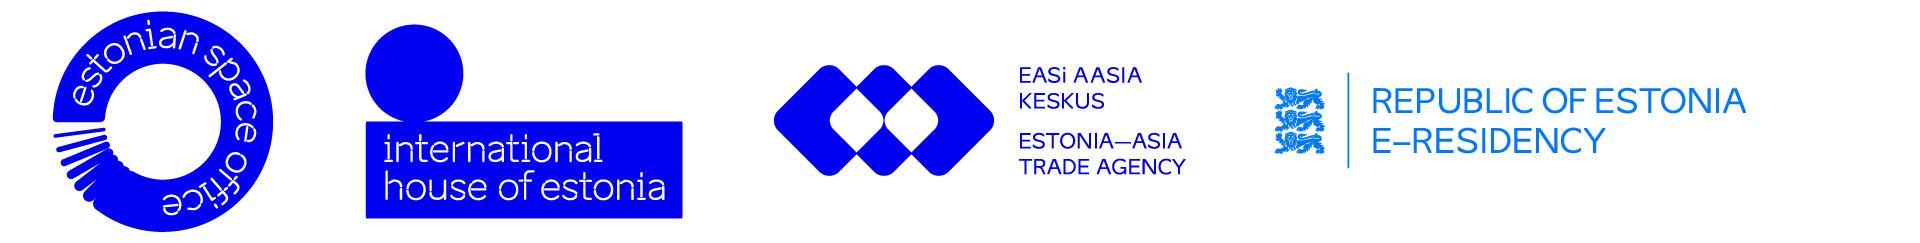 brand estonia logo examples